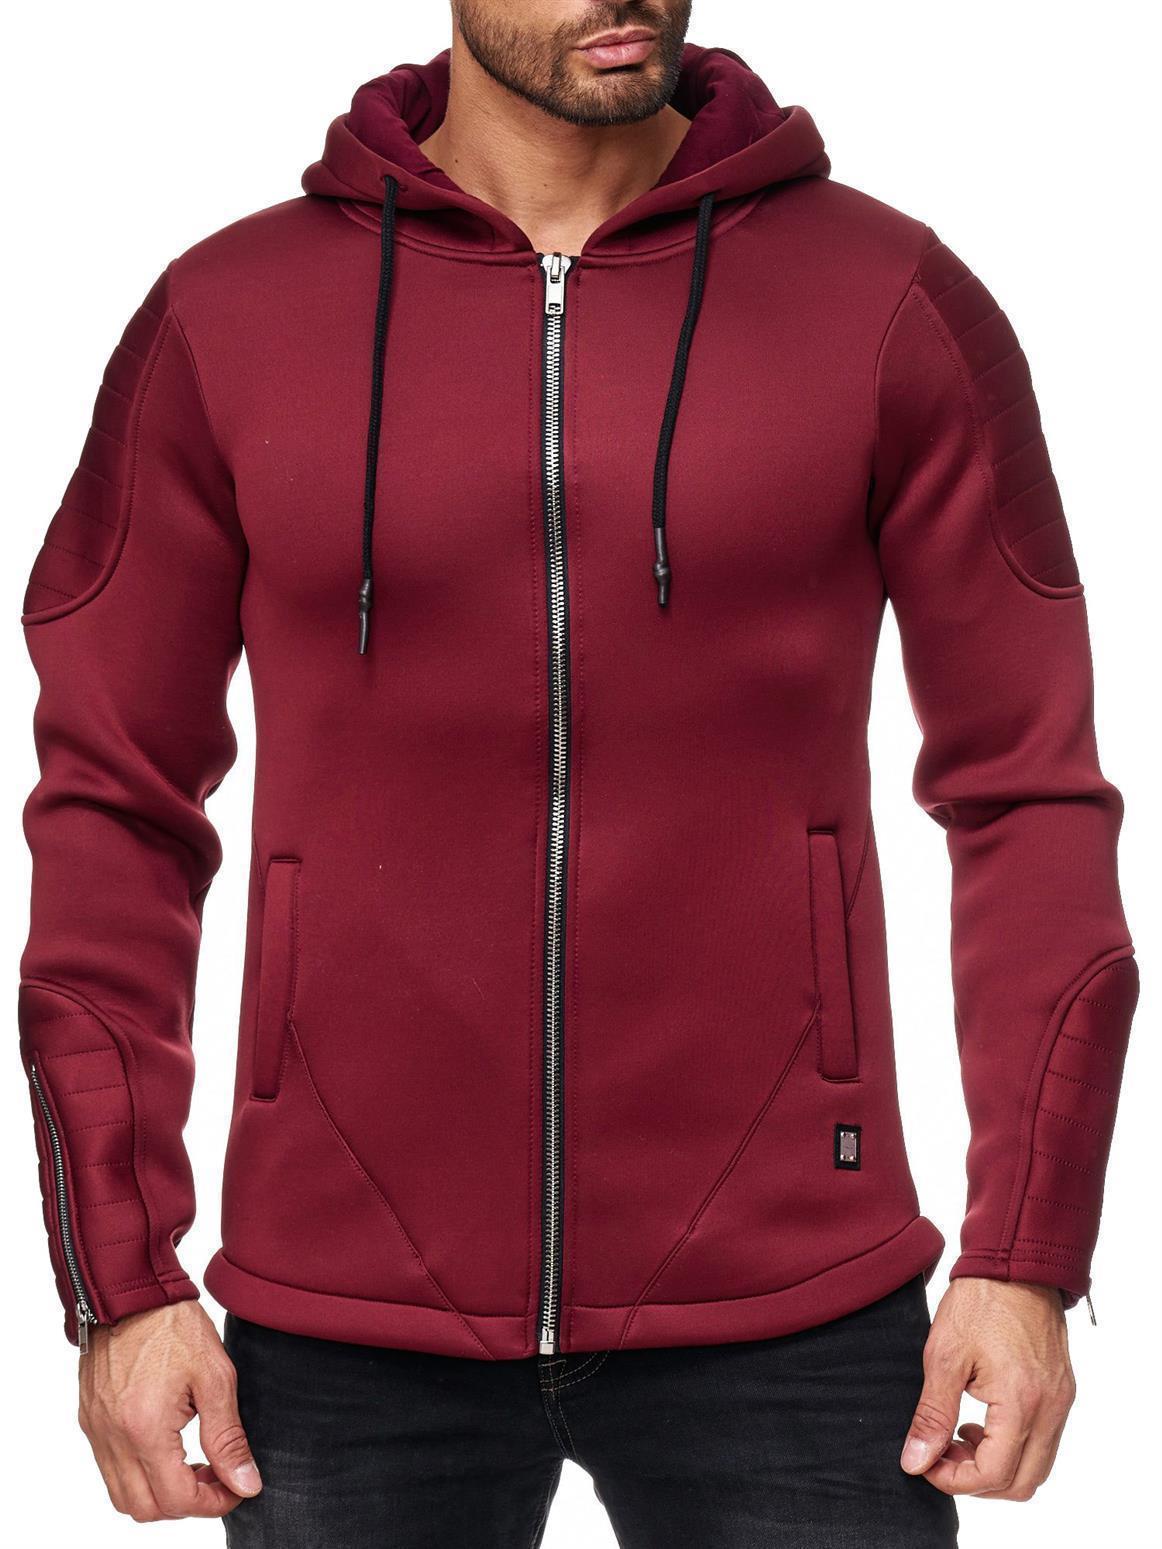 Redbridge-Herren-Jacke-Sweatjacke-Ubergangsjacke-Kapuze-Jacket-Neopren- 2d604b85e1